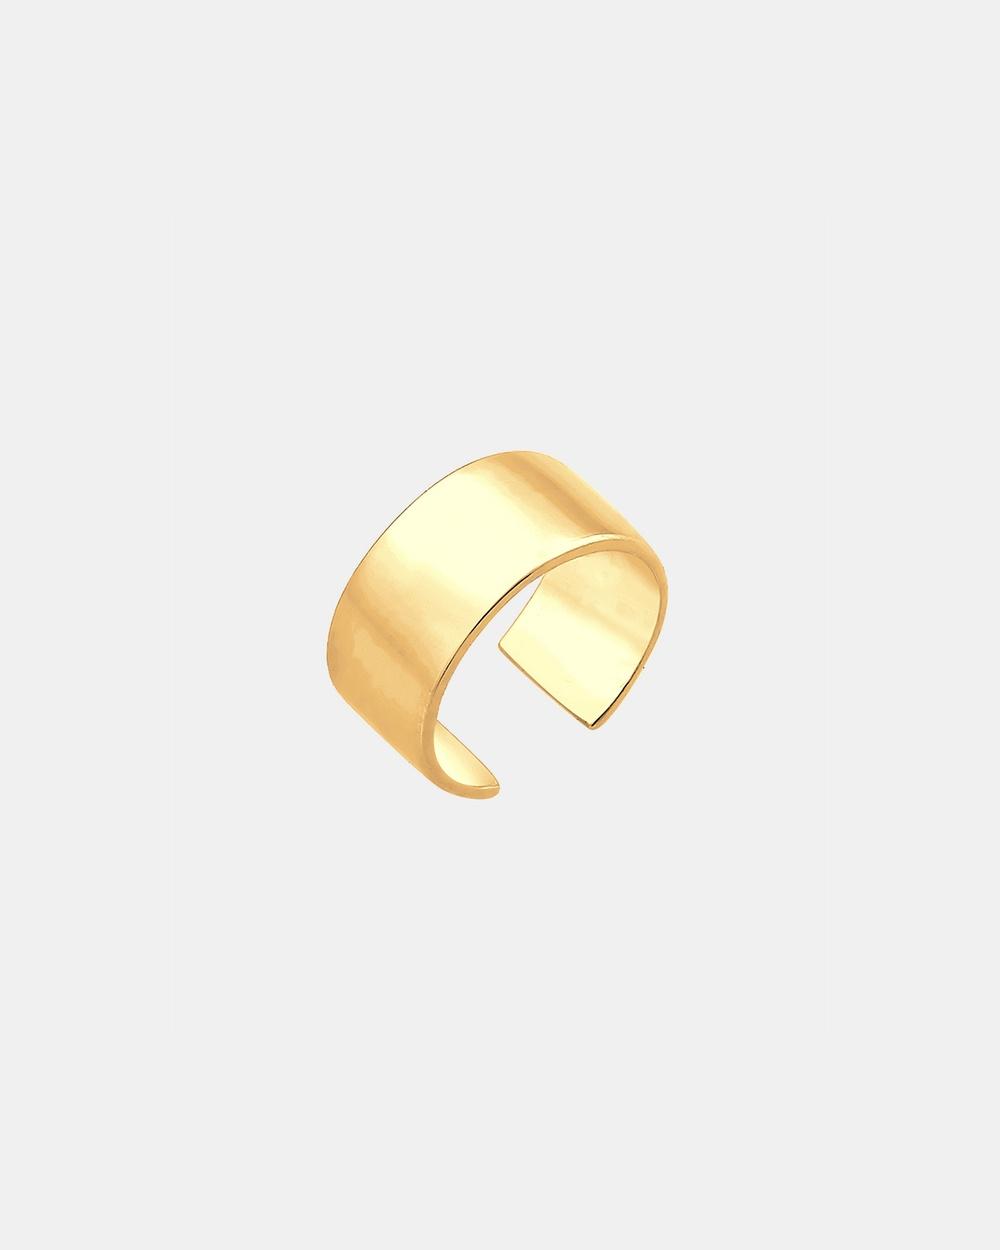 Elli Jewelry Earrings Ear Cuff Basic 925 Sterling Silver Gold Plated Jewellery Gold